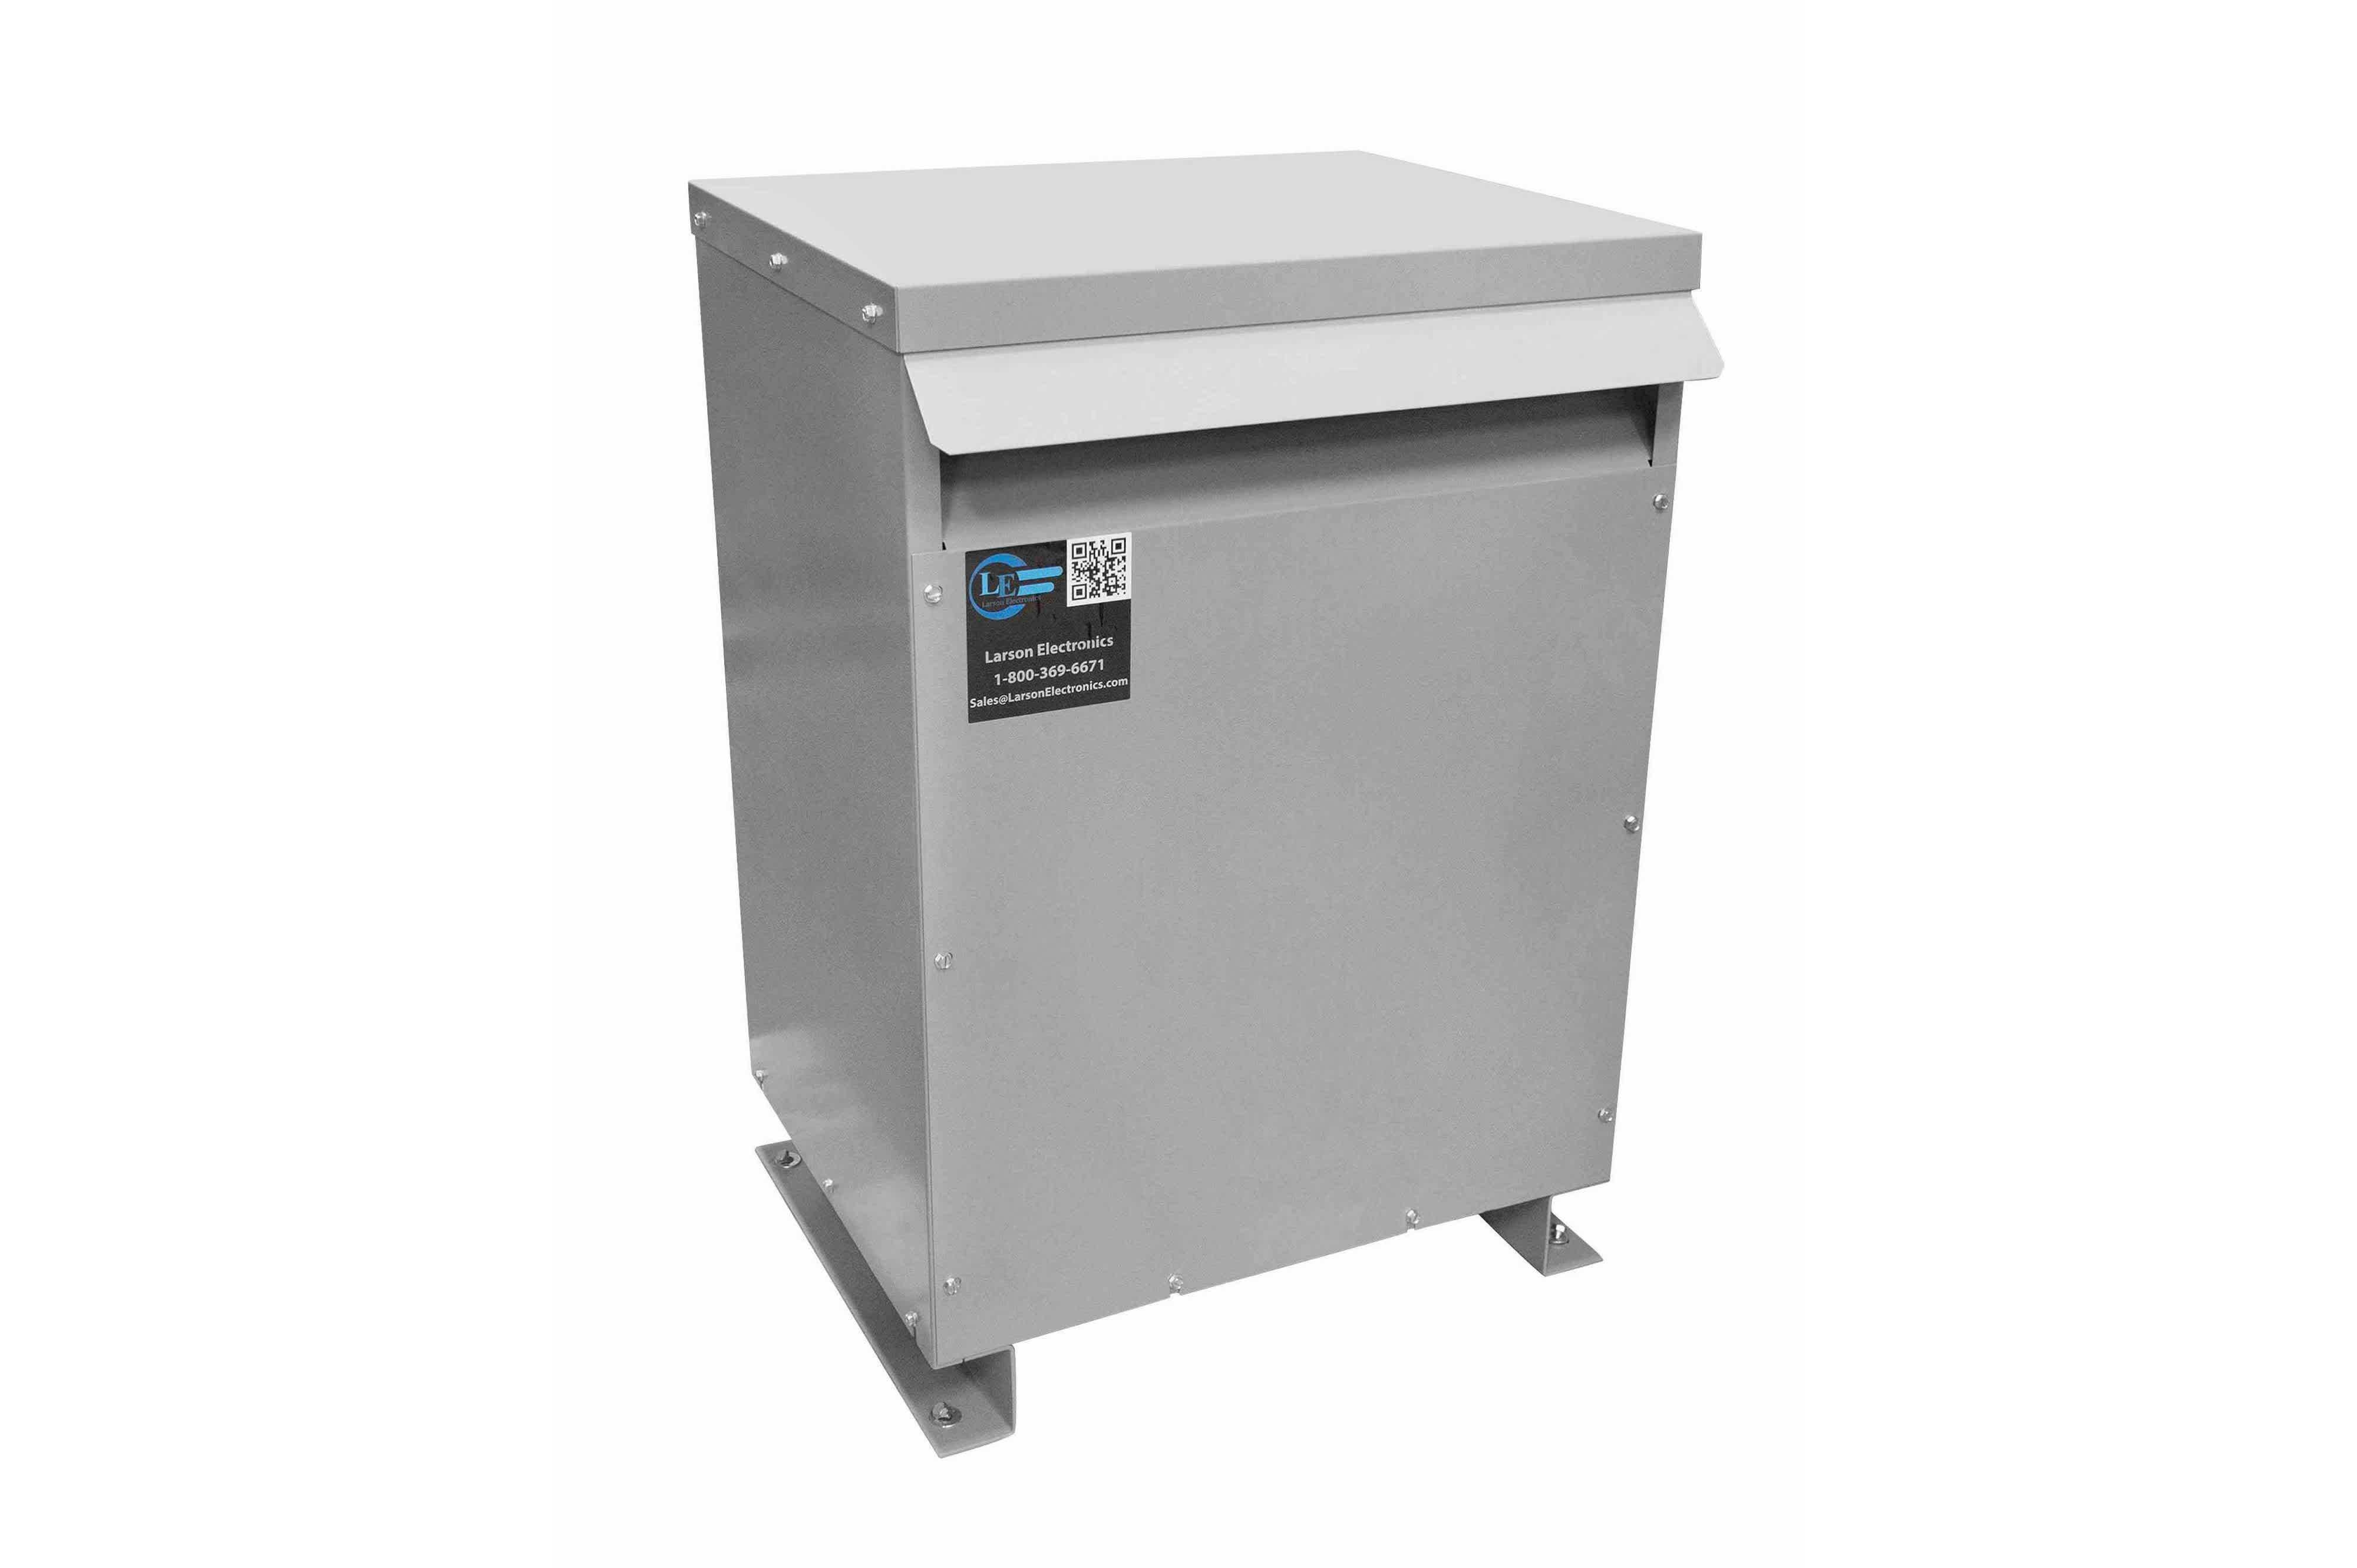 90 kVA 3PH Isolation Transformer, 240V Wye Primary, 380Y/220 Wye-N Secondary, N3R, Ventilated, 60 Hz